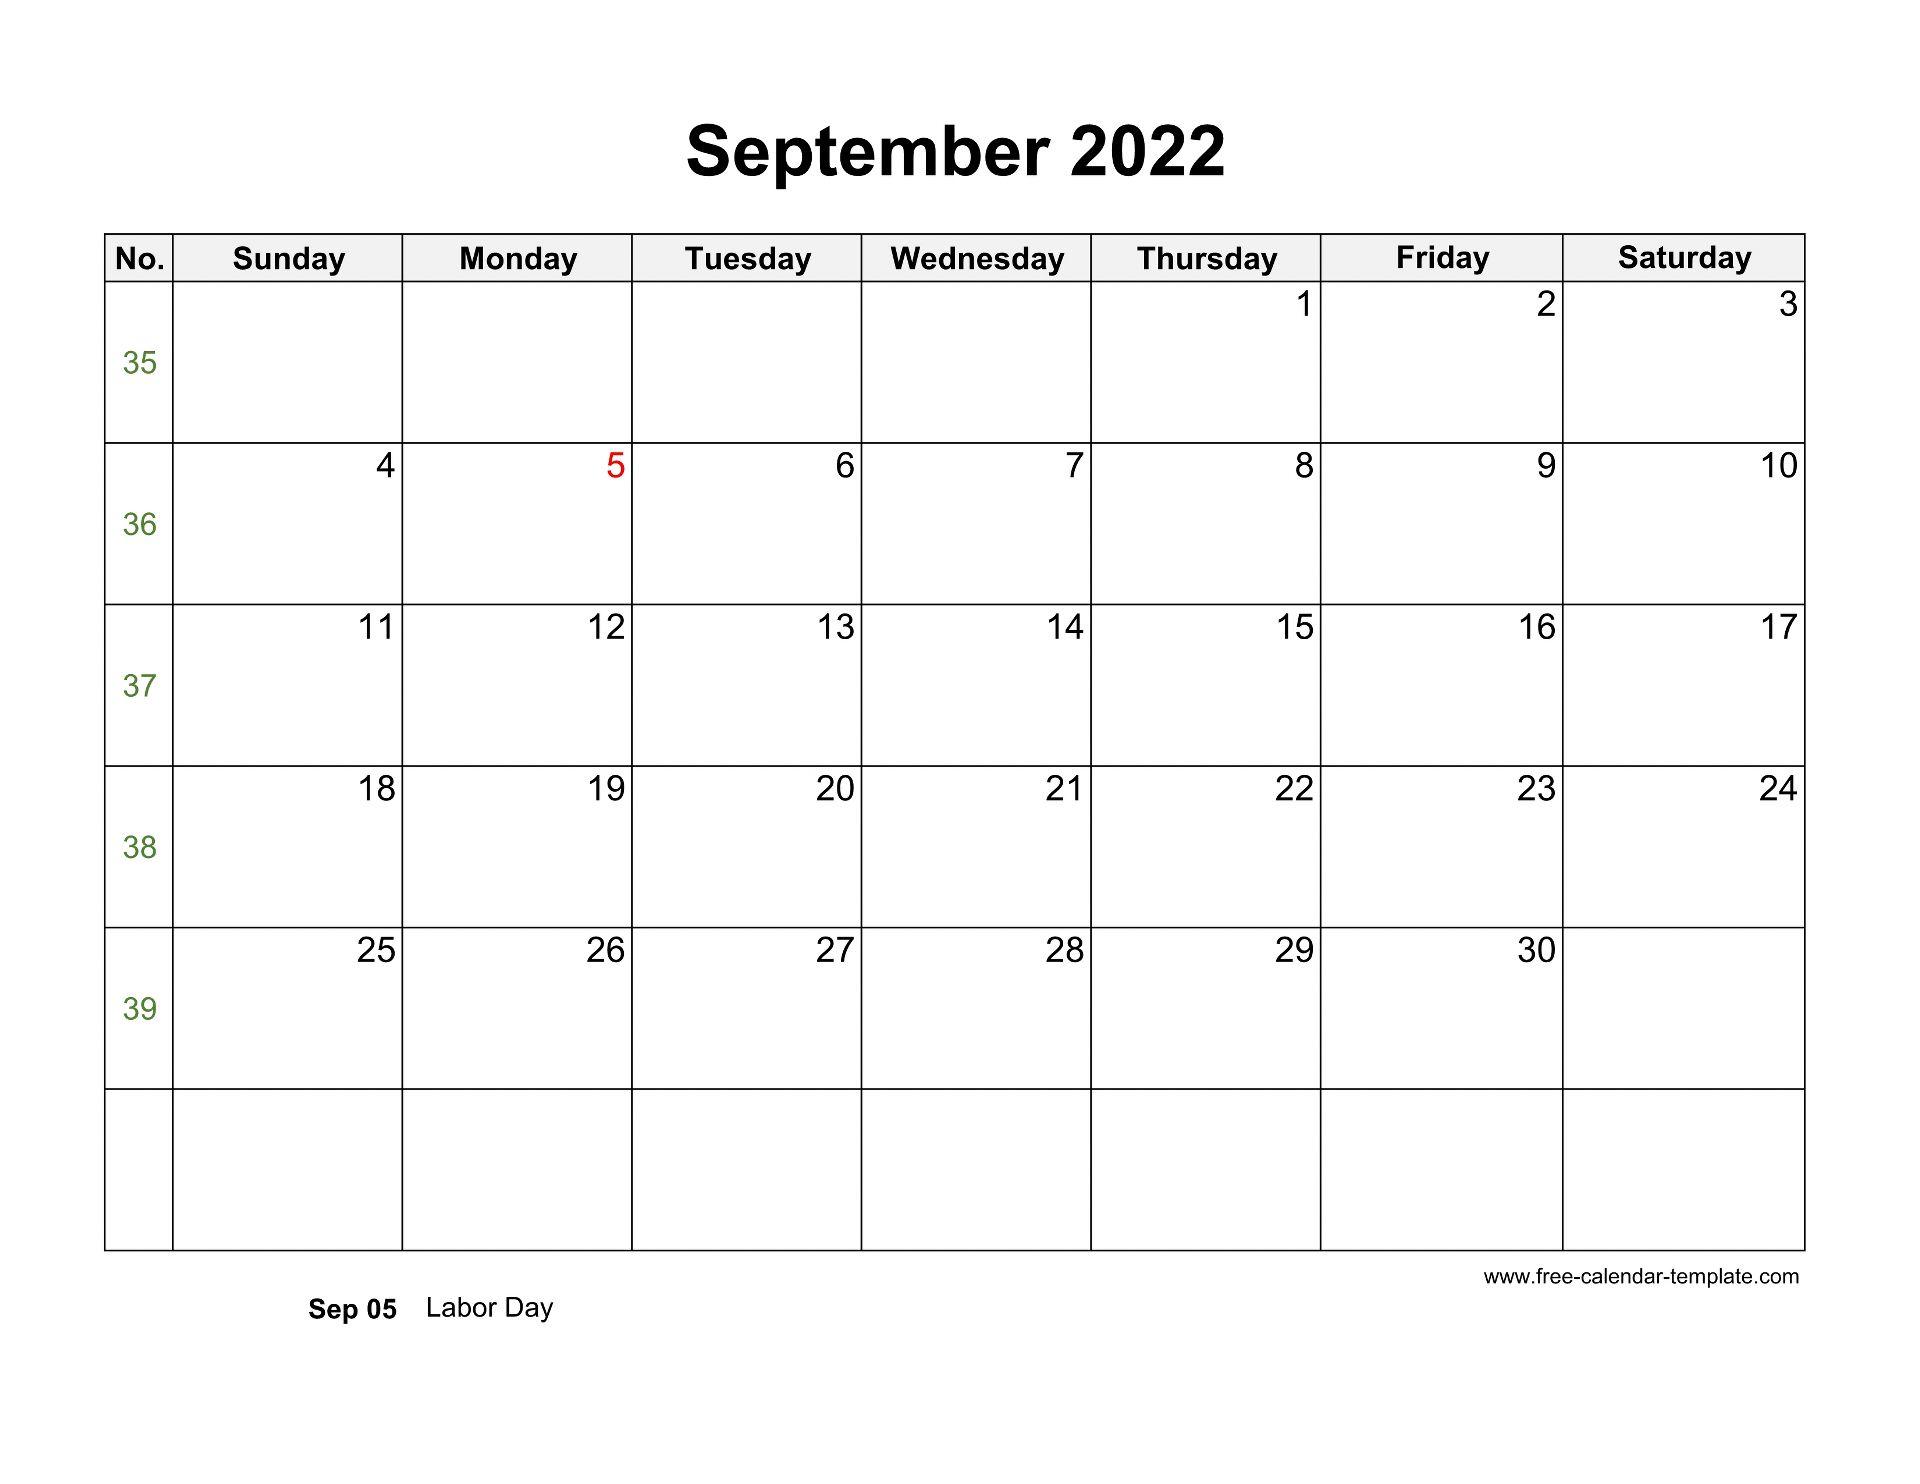 Blank September 2022 Calendar.Free 2022 Calendar Blank September Template Horizontal Free Calendar Template Com